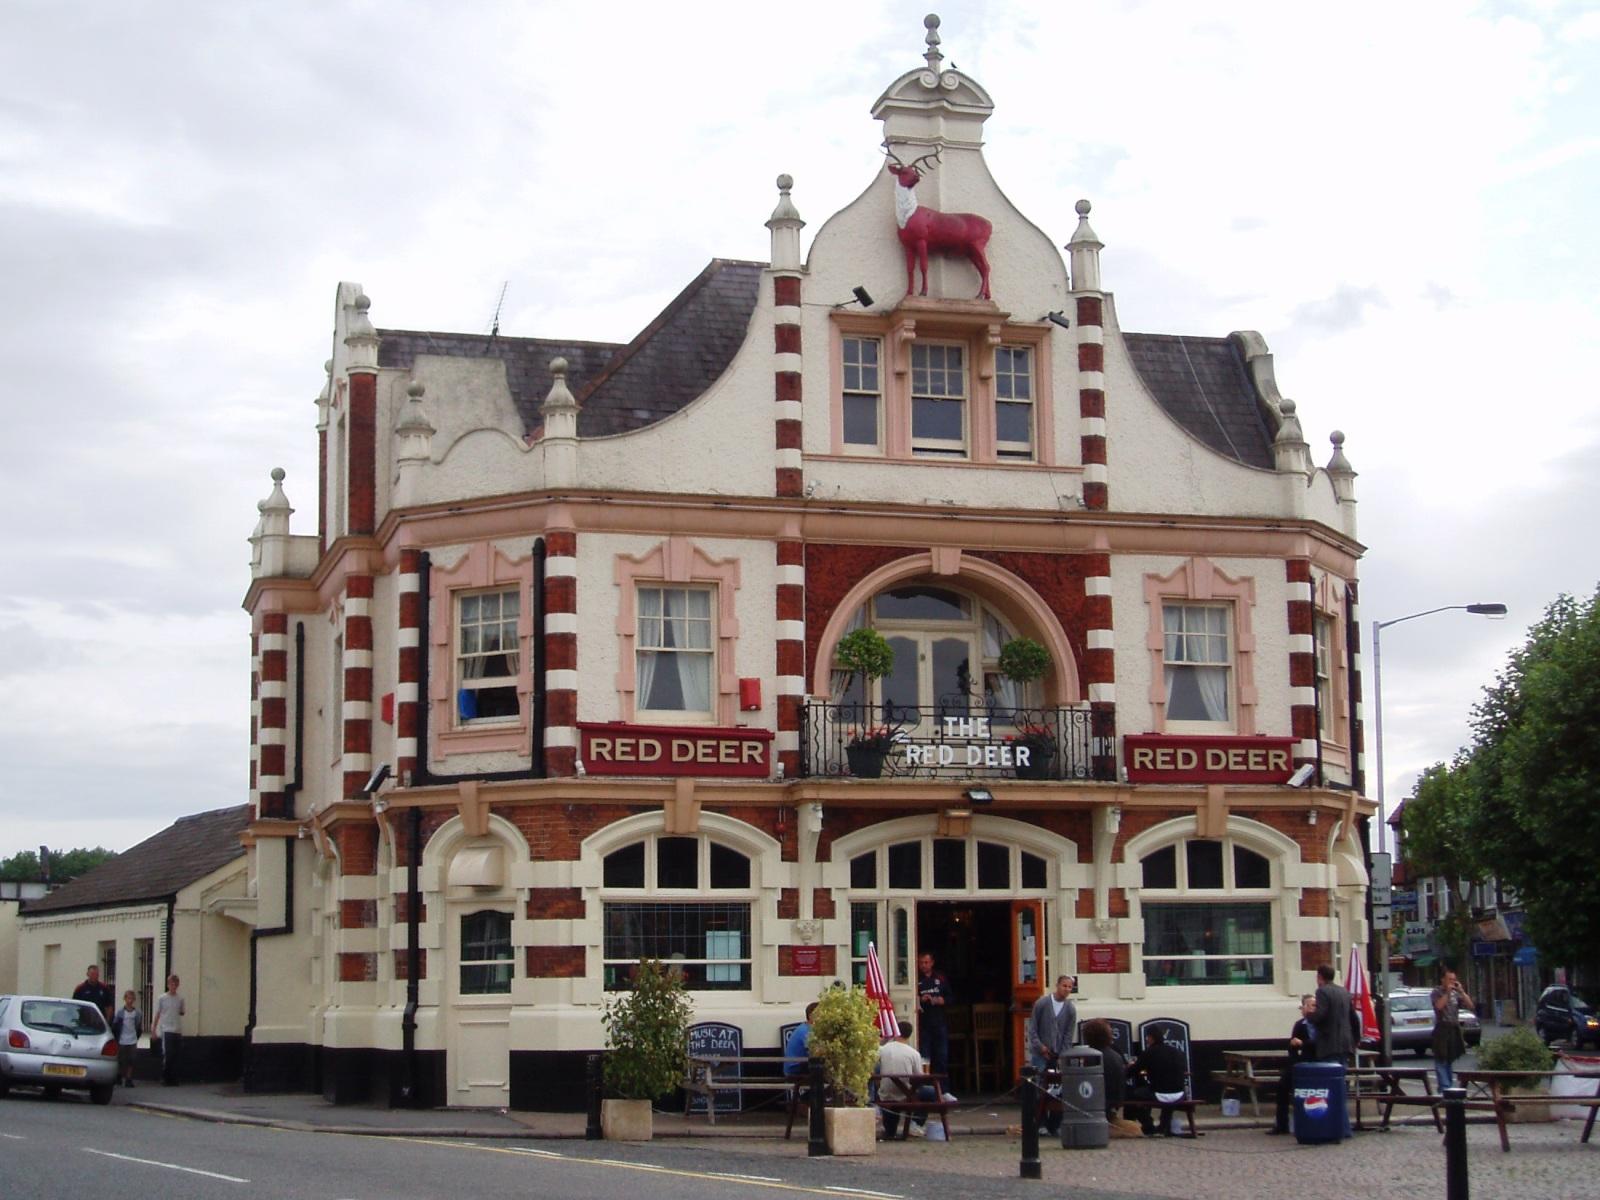 Folly, South Croydon, CR2 | A pub with a name that's temptin… | Flickr